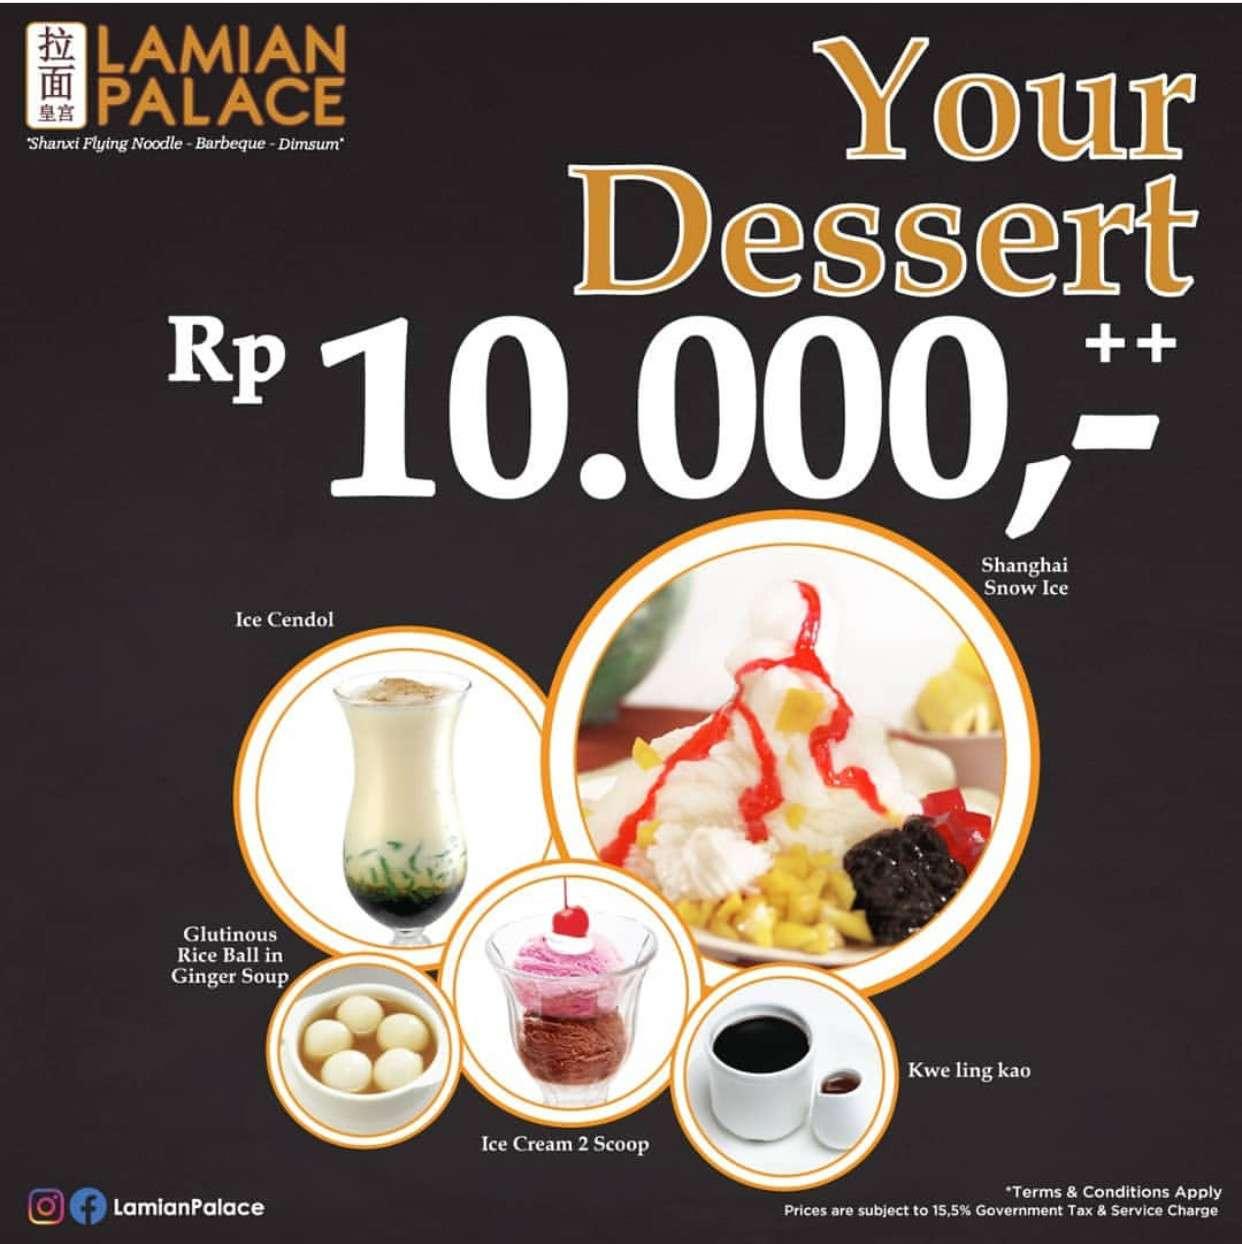 Diskon Lamian Palace Promo Makan dessert hanya Rp 10.000,-++